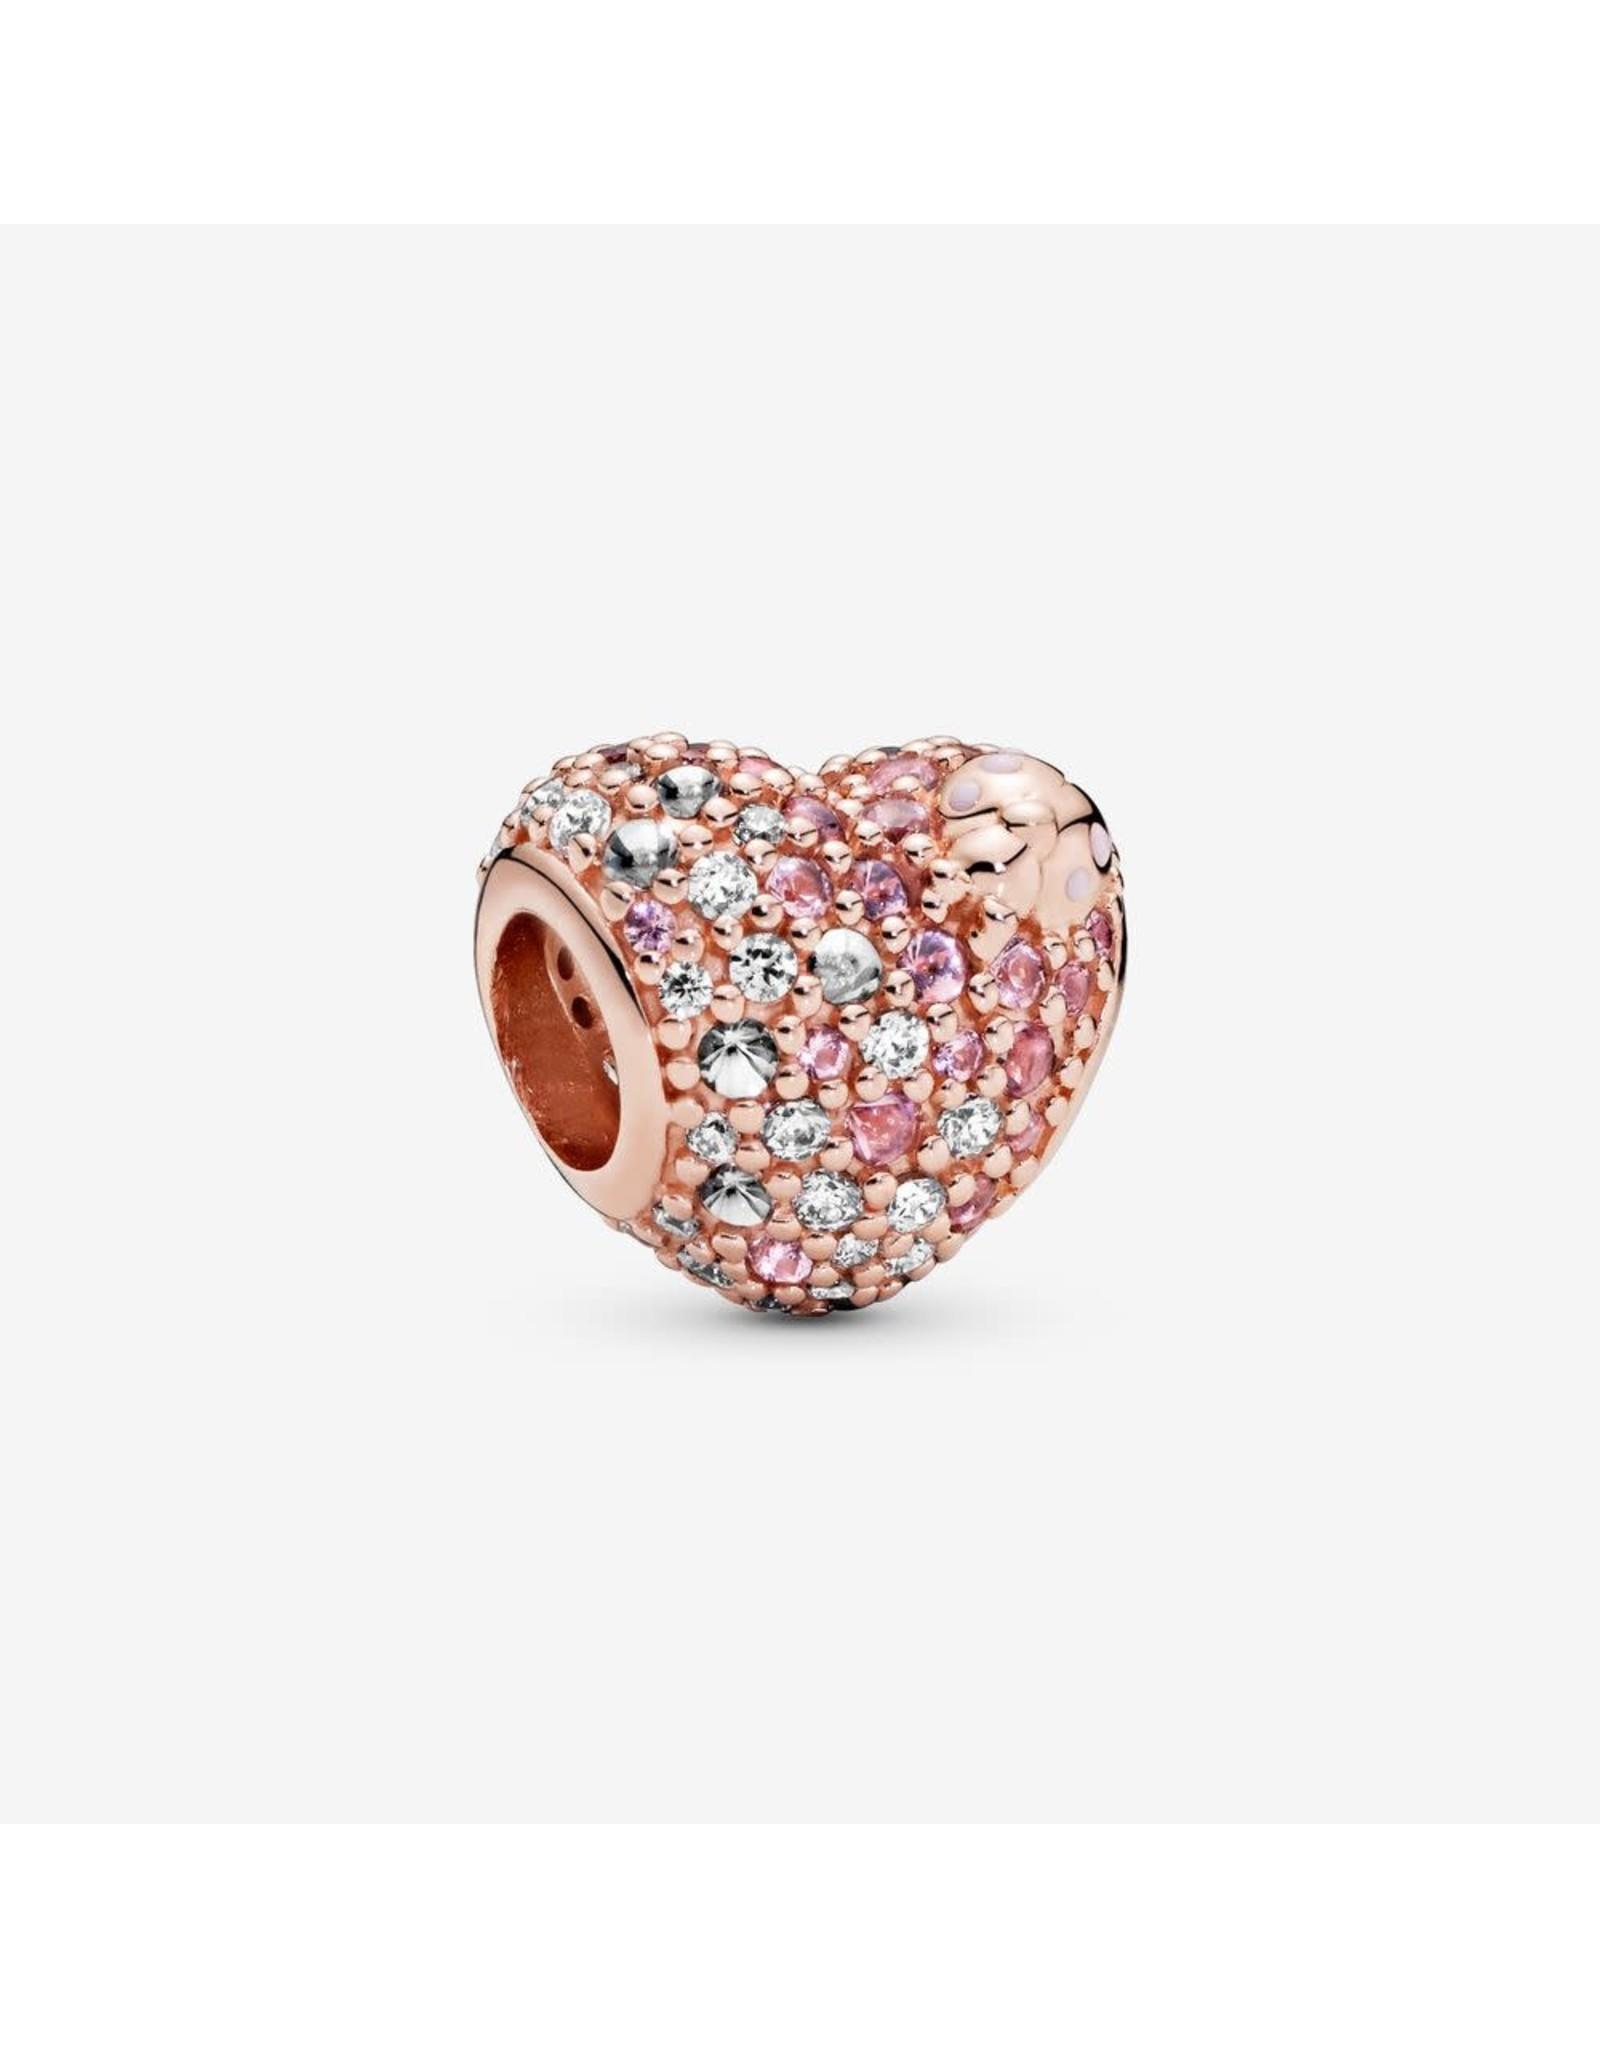 Pandora Pandora Gleaming Ladybird Heart, Pink Enamel, Crystals & Clear CZ